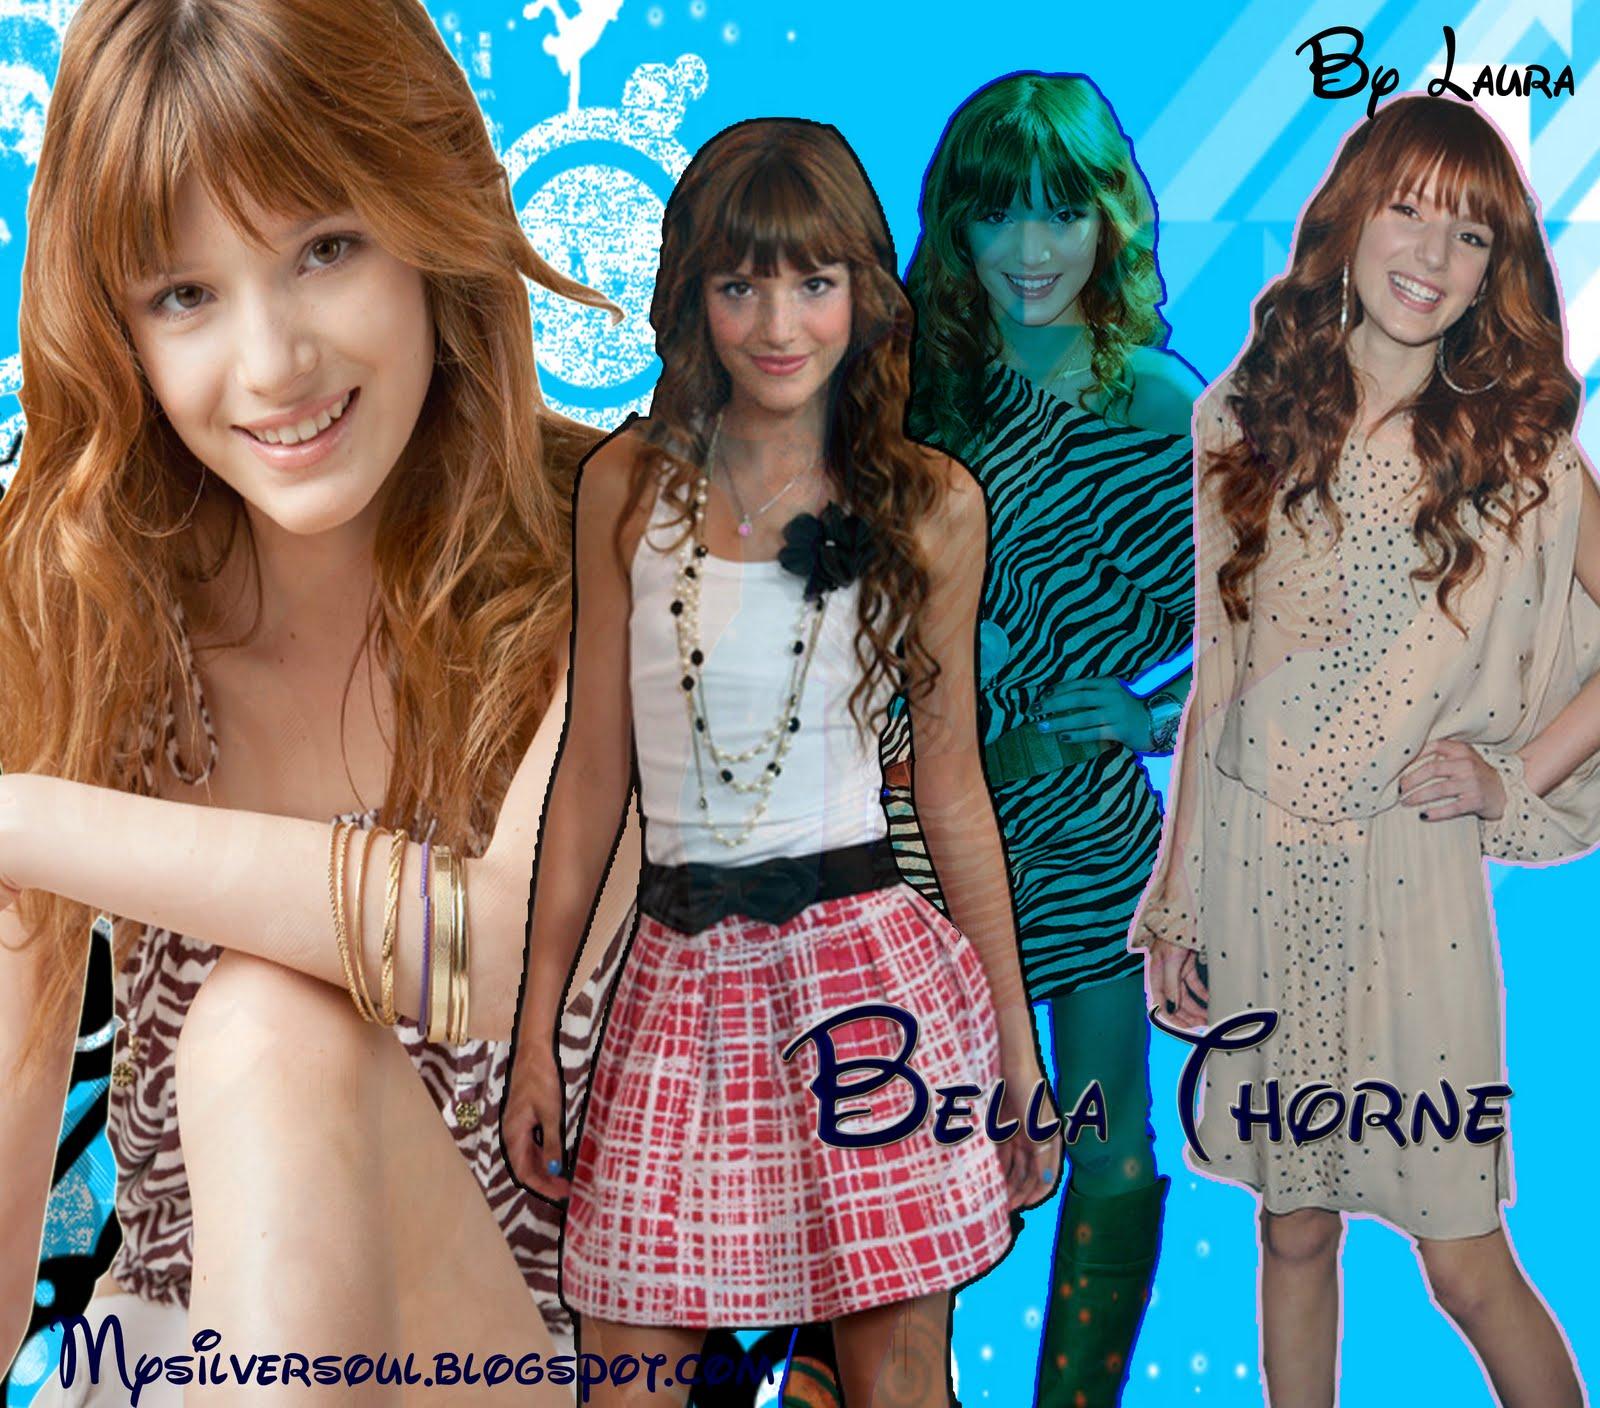 http://2.bp.blogspot.com/-HeL0E6AS3iI/TaGm8wHTqcI/AAAAAAAAATA/a5_Vq1j9Z8c/s1600/blendbellathorne.jpg